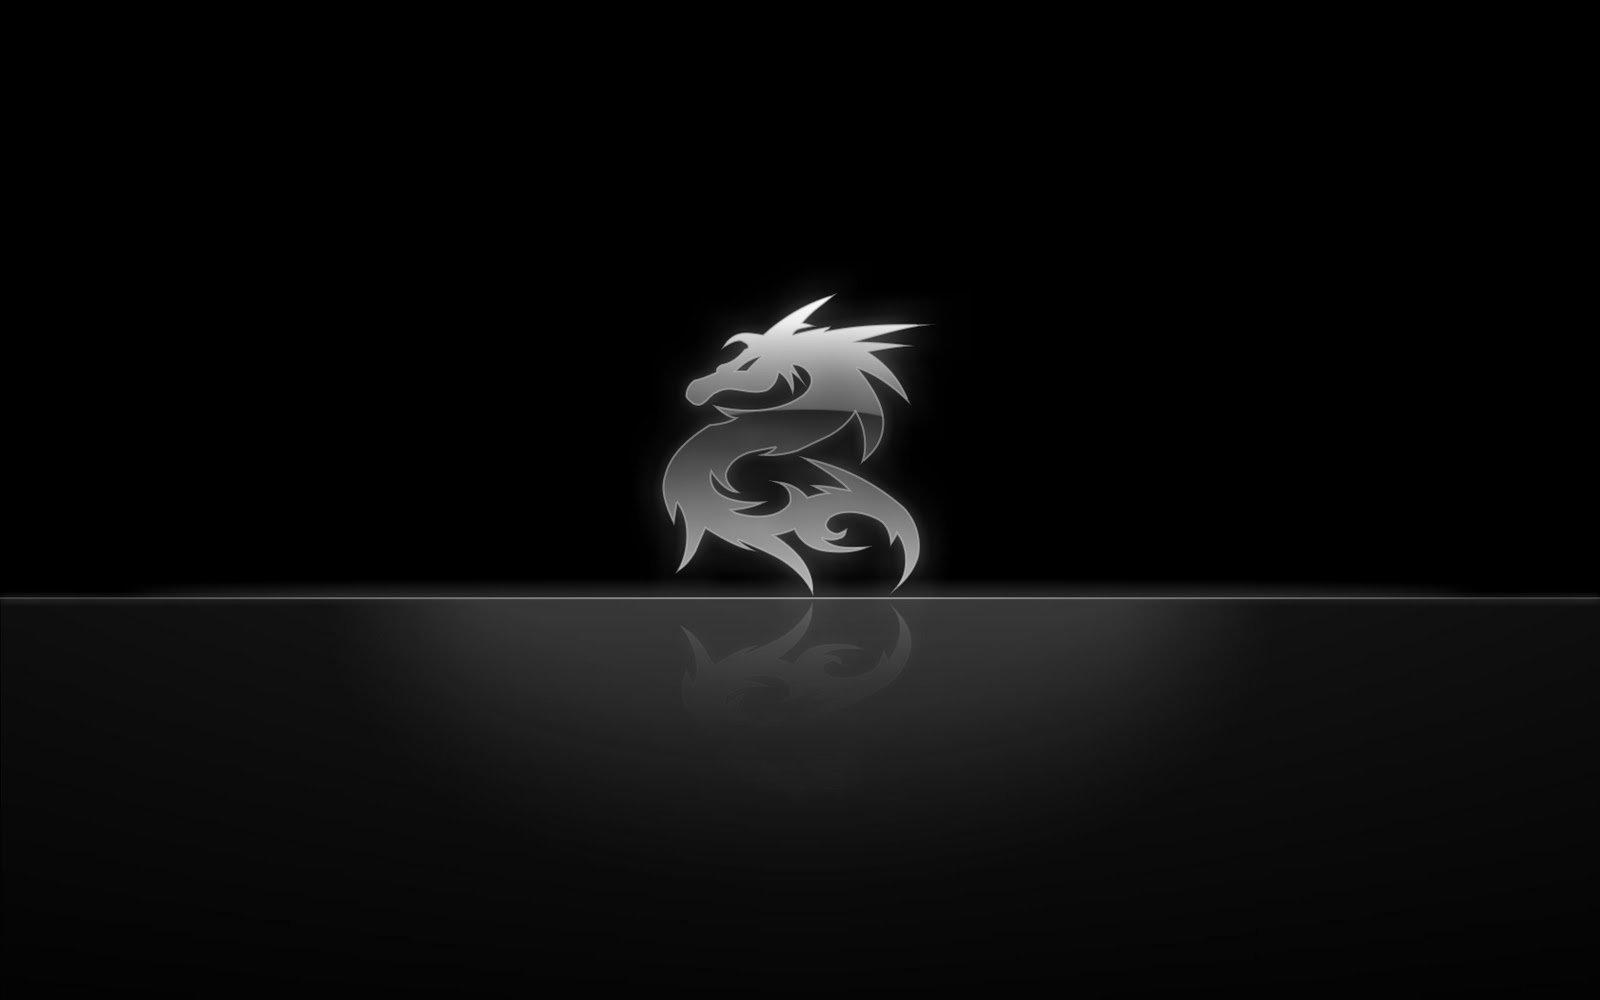 Silver Hd Wallpaper: Black Silver HD Wallpaper